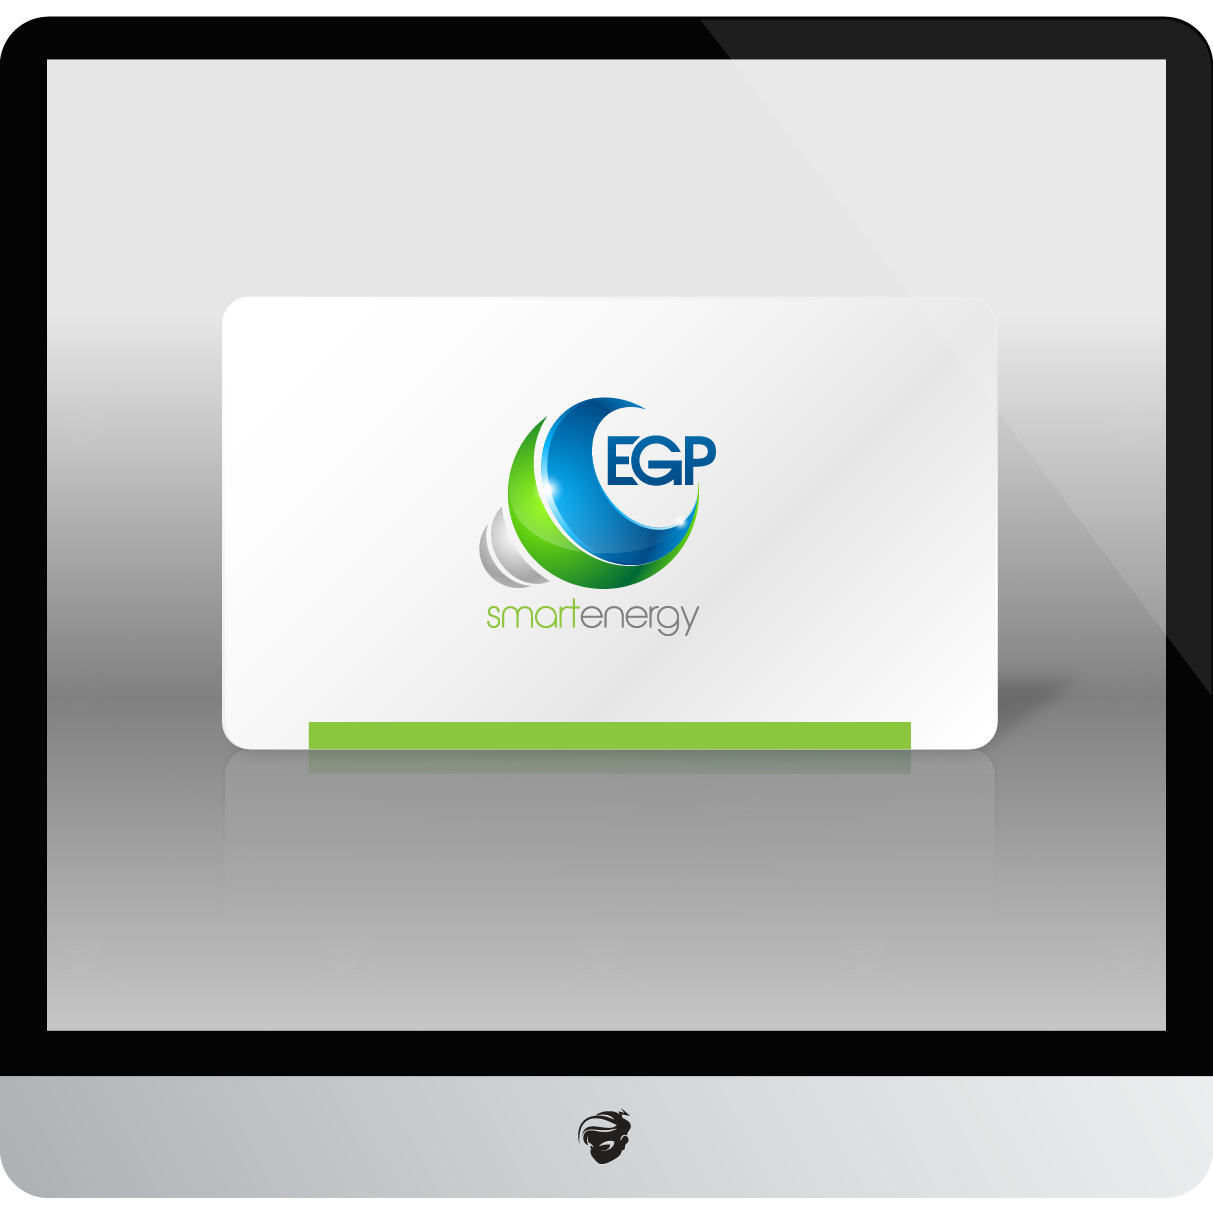 Logo Design by zesthar - Entry No. 110 in the Logo Design Contest Captivating Logo Design for EGP Smart Energy.